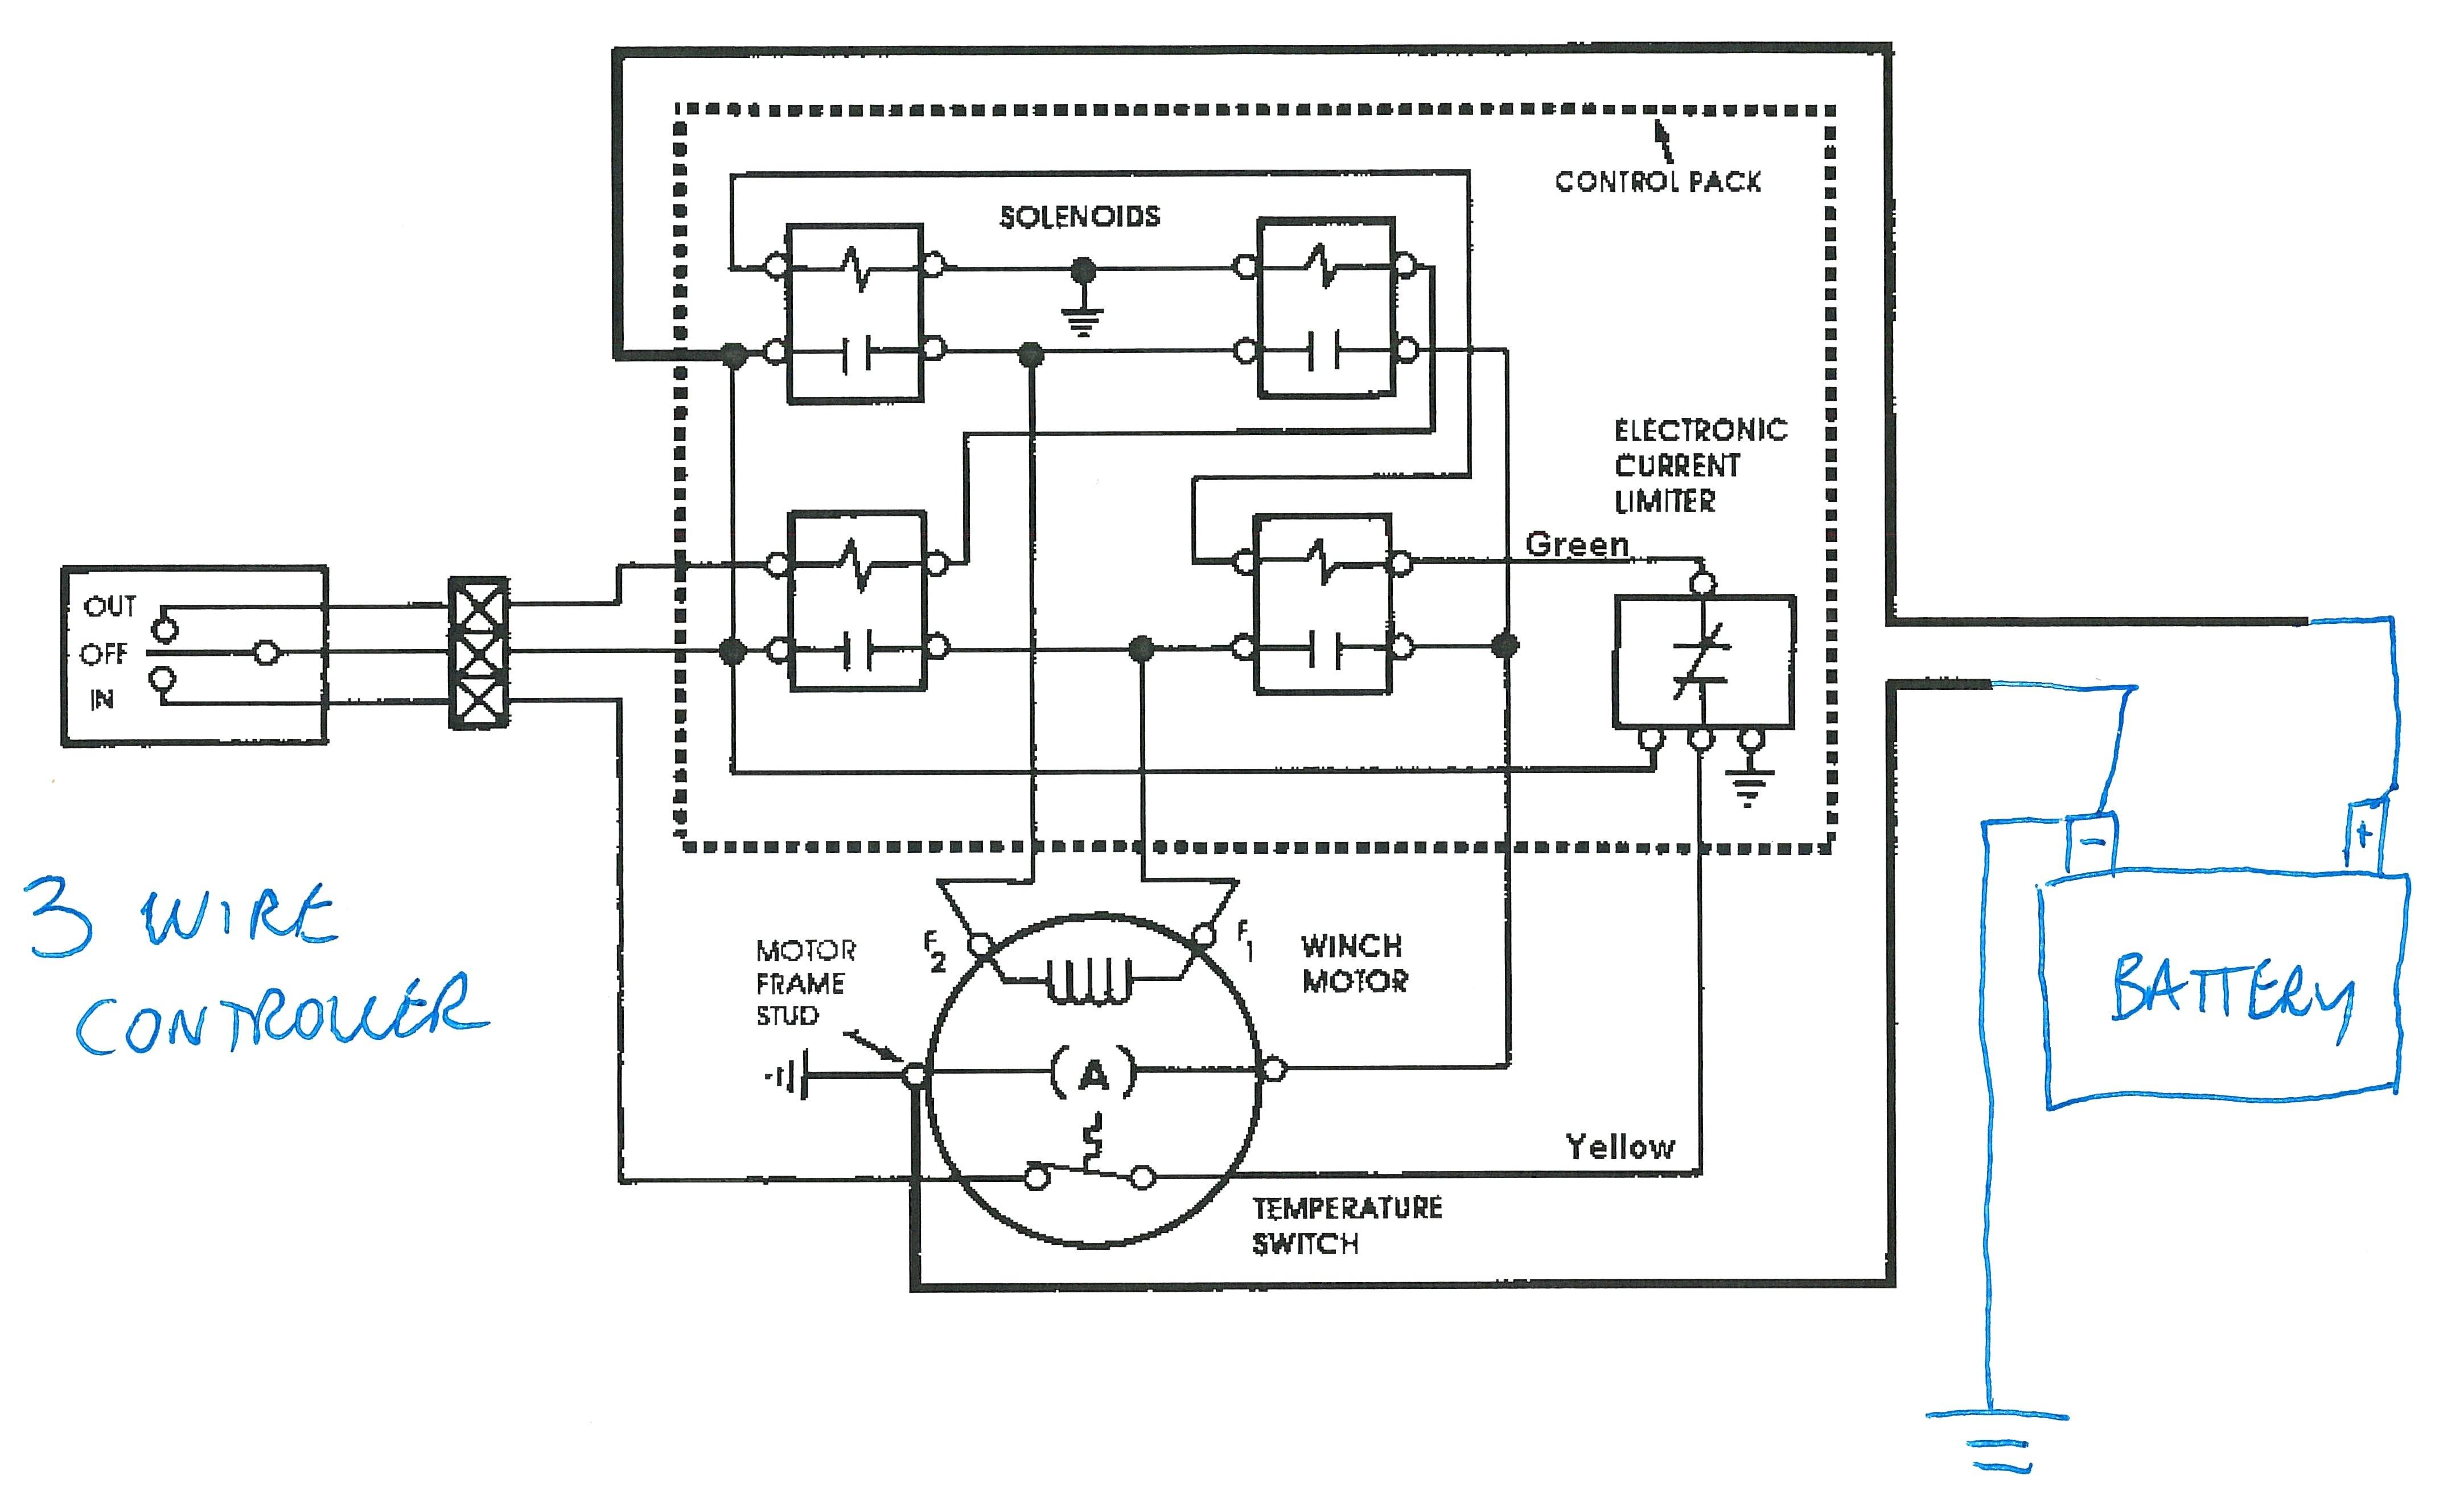 Reversing Solenoid Wiring Diagram | Wiring Library - 12 Volt Winch Solenoid Wiring Diagram